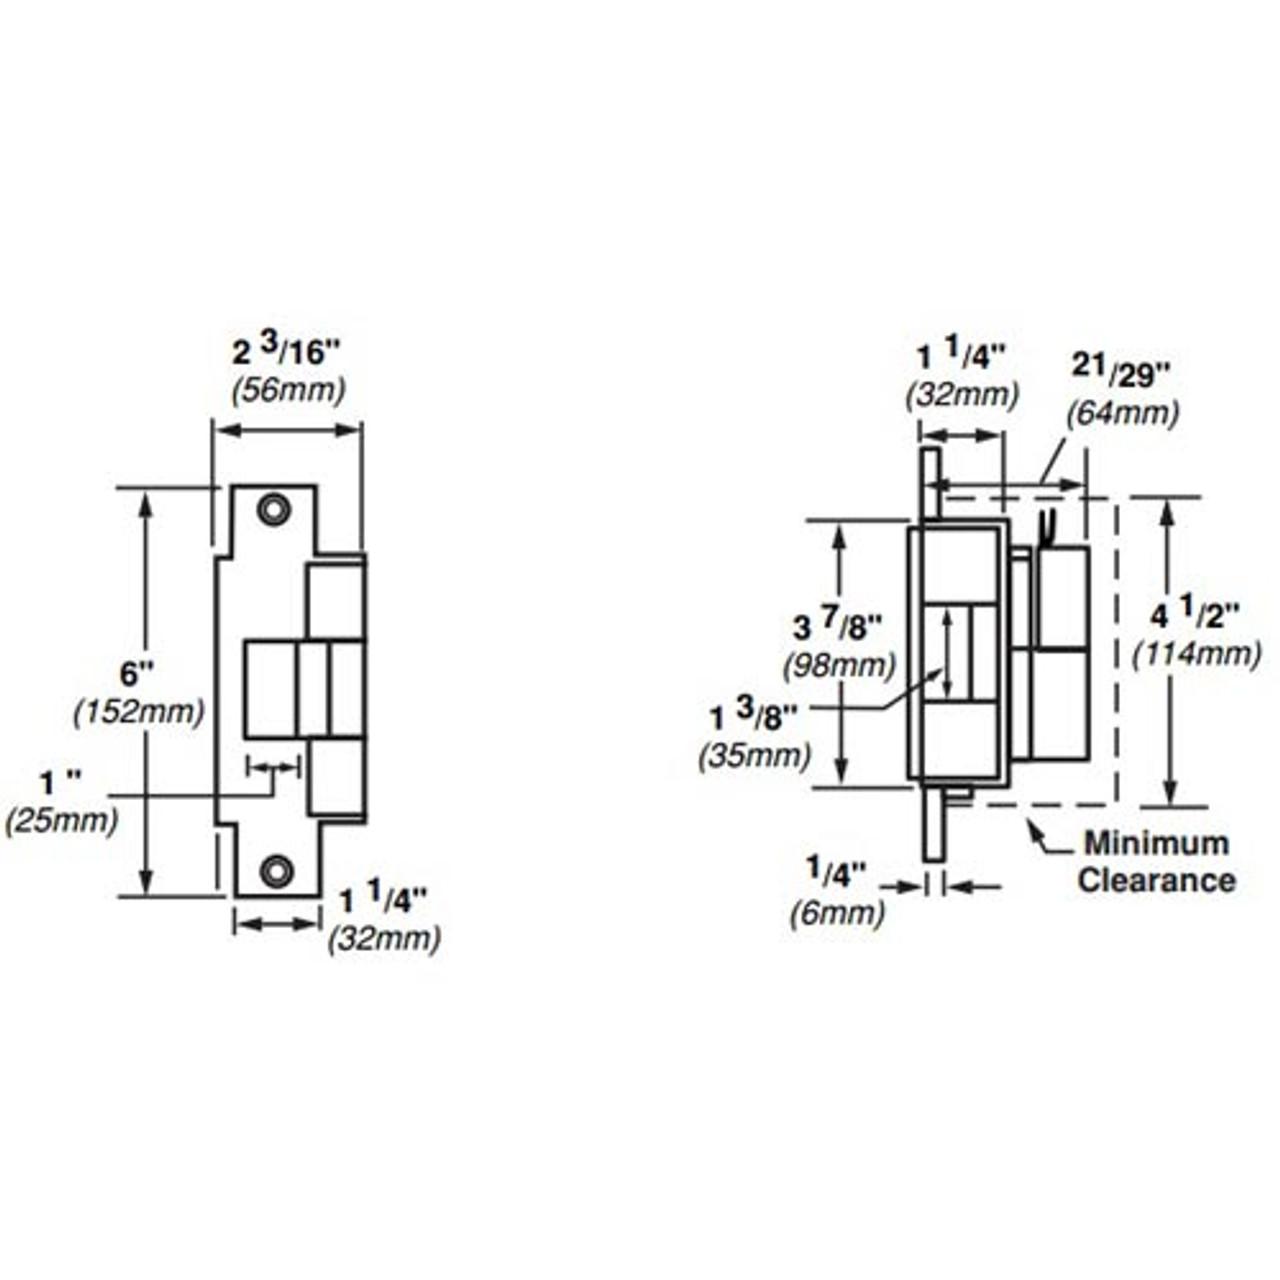 6213-FS-24VDC-US10 Von Duprin Electric Strike for Mortise or Cylindrical Locksets in Satin Bronze Finish